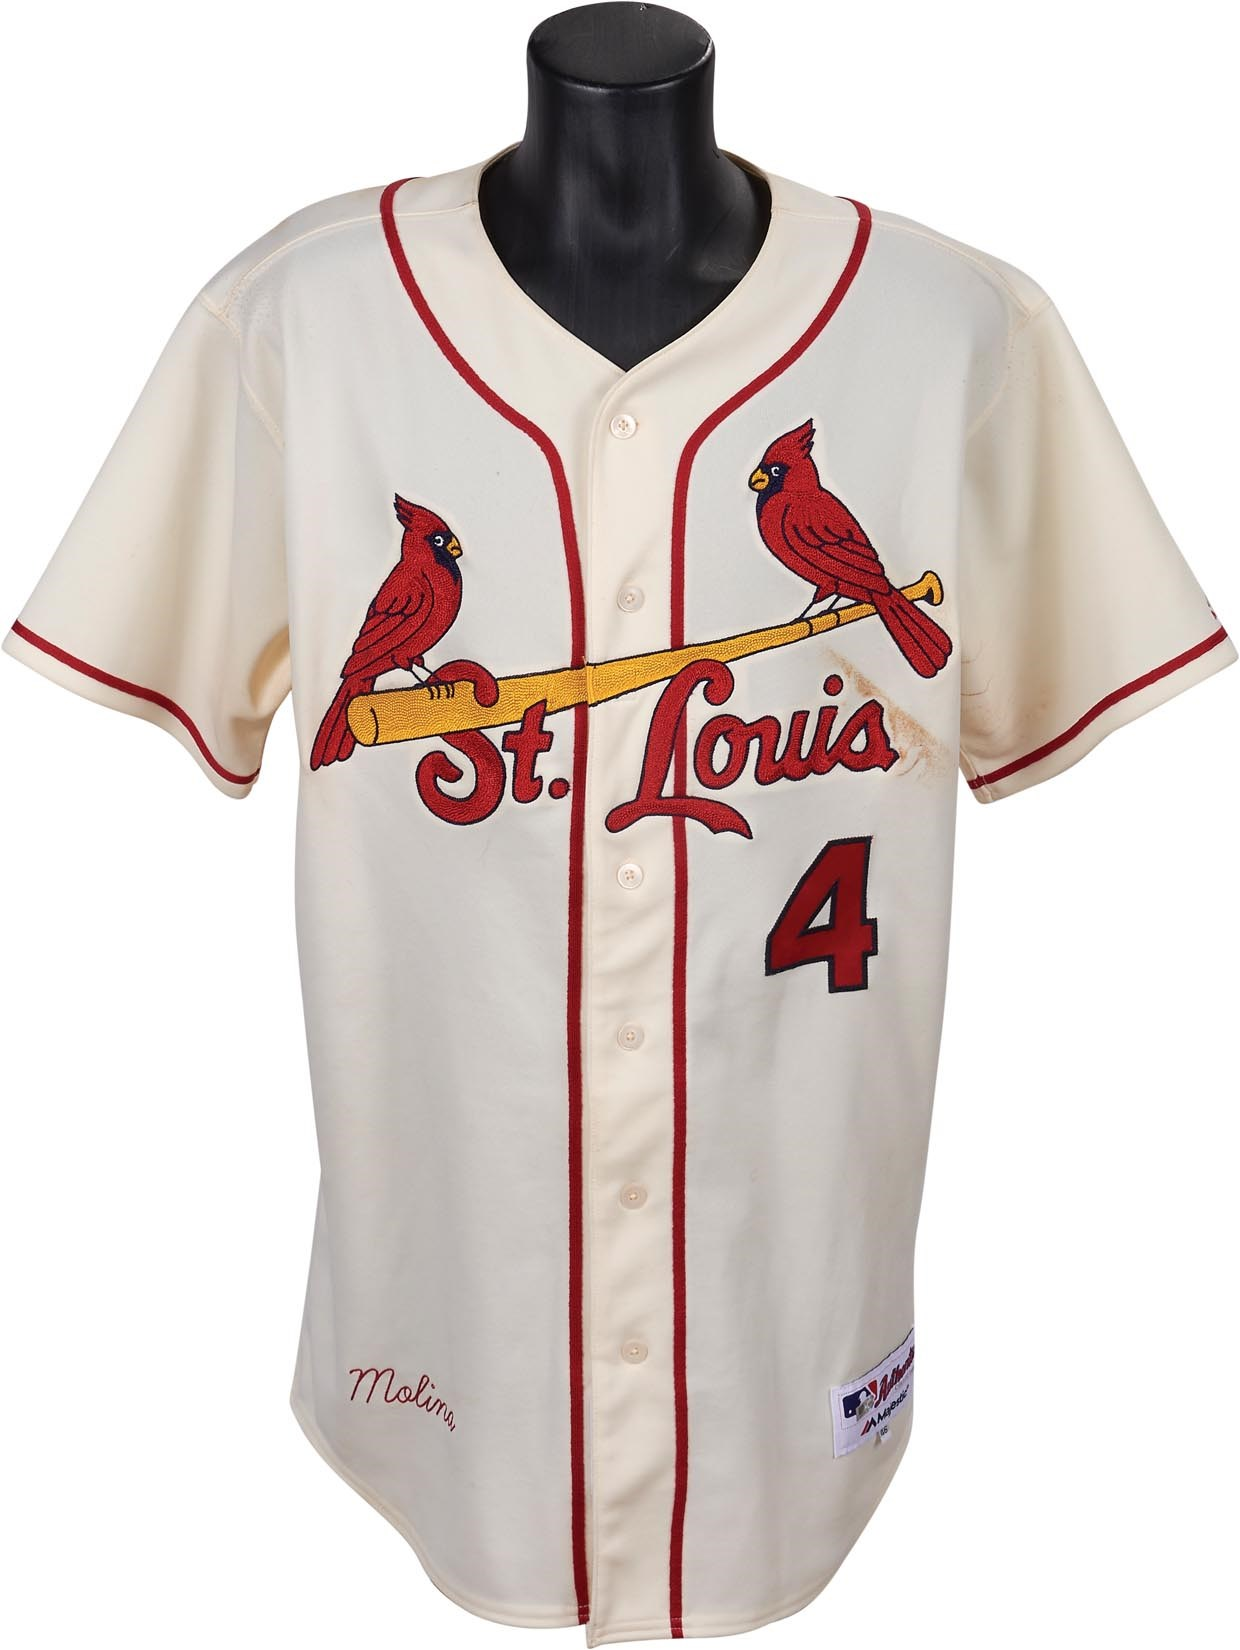 St. Louis Cardinals - 2018 Invitational